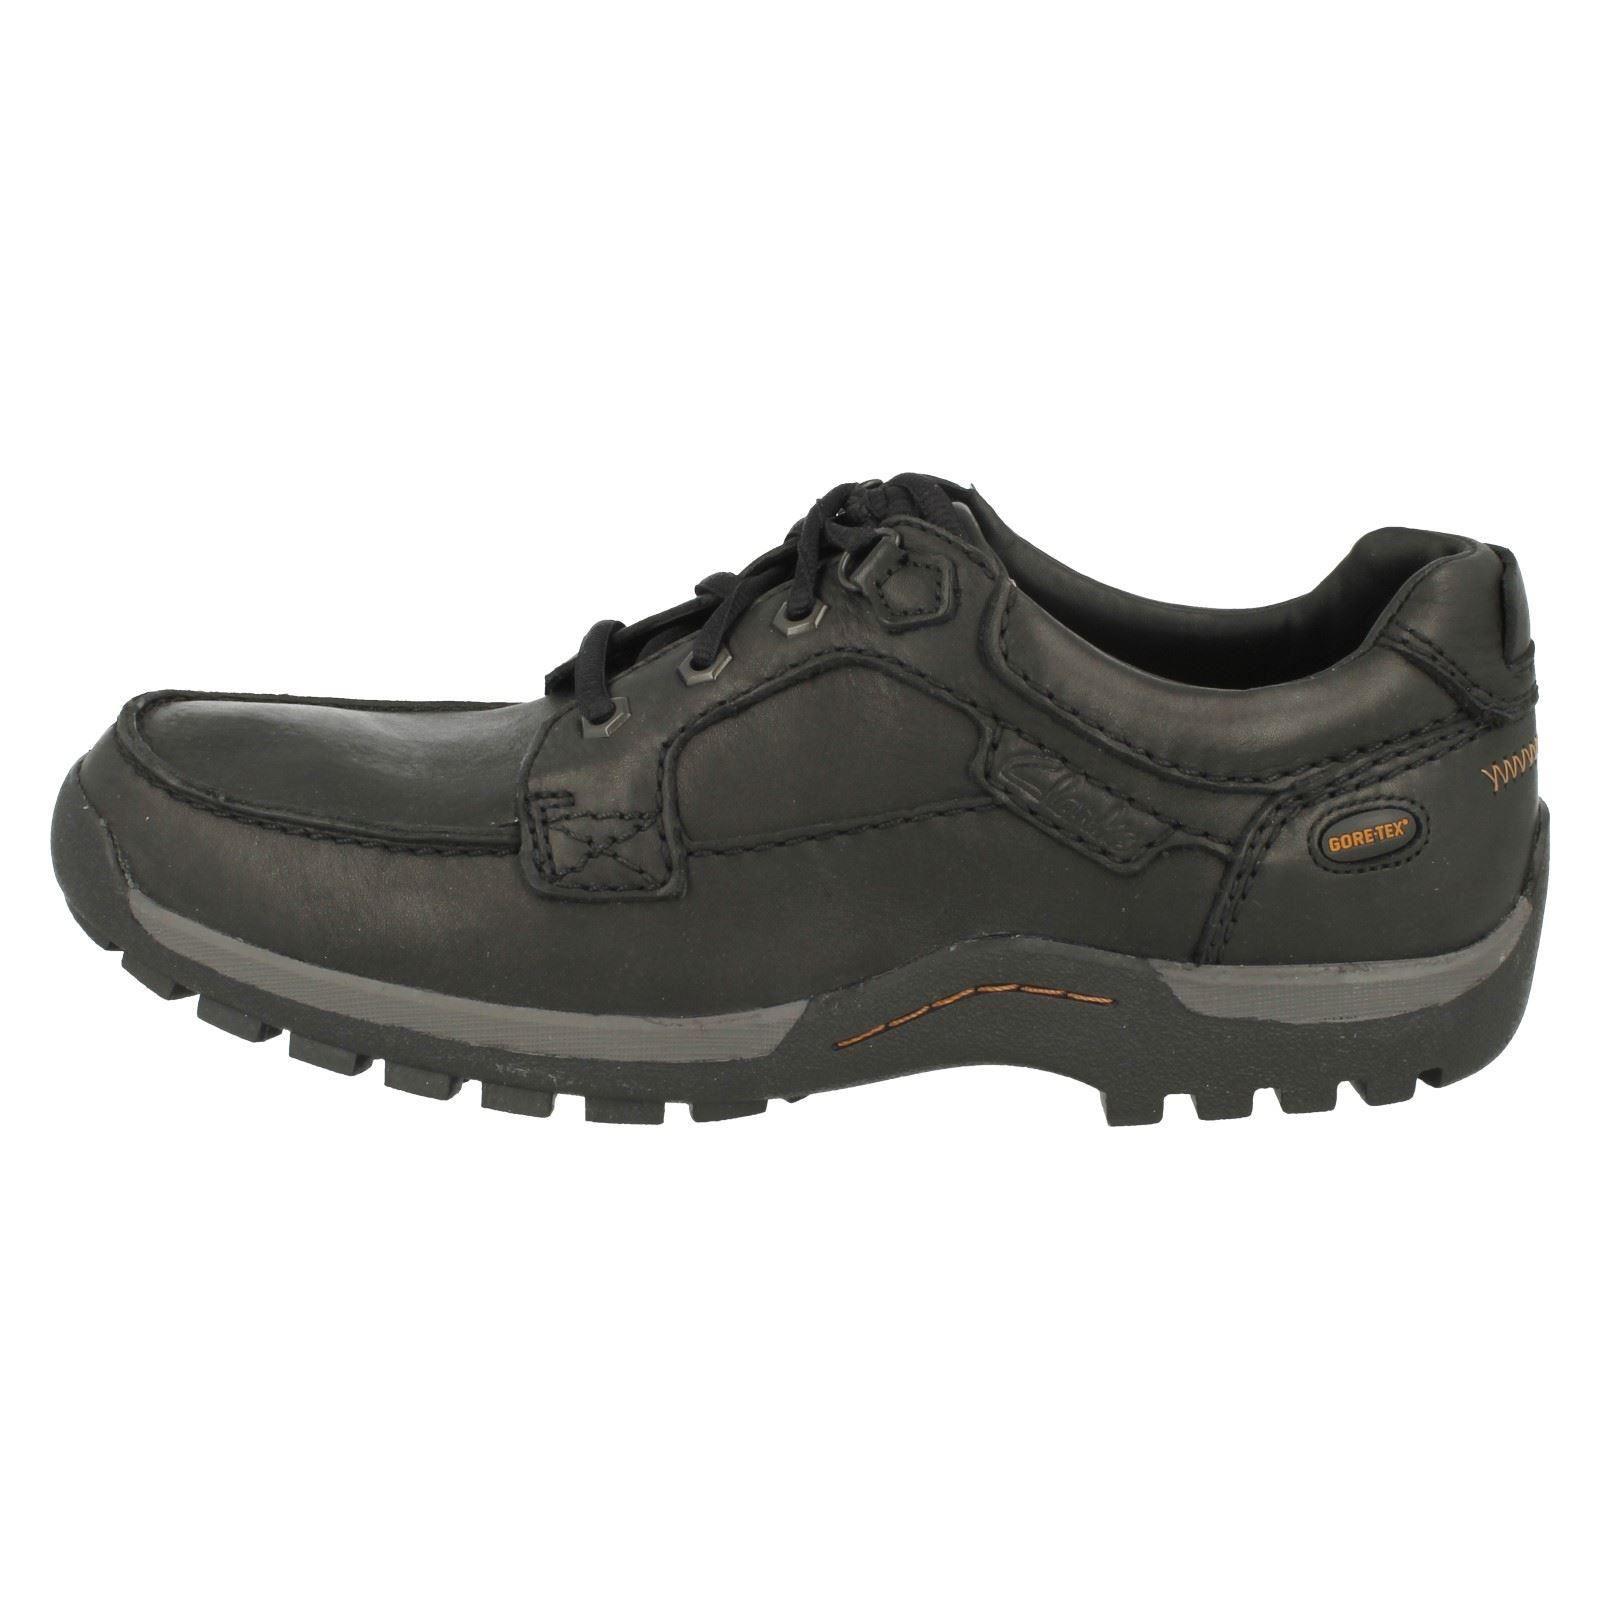 Uomo Clarks Rain Casual Lace Up Schuhes, Rain Clarks Tech GTX 013fca